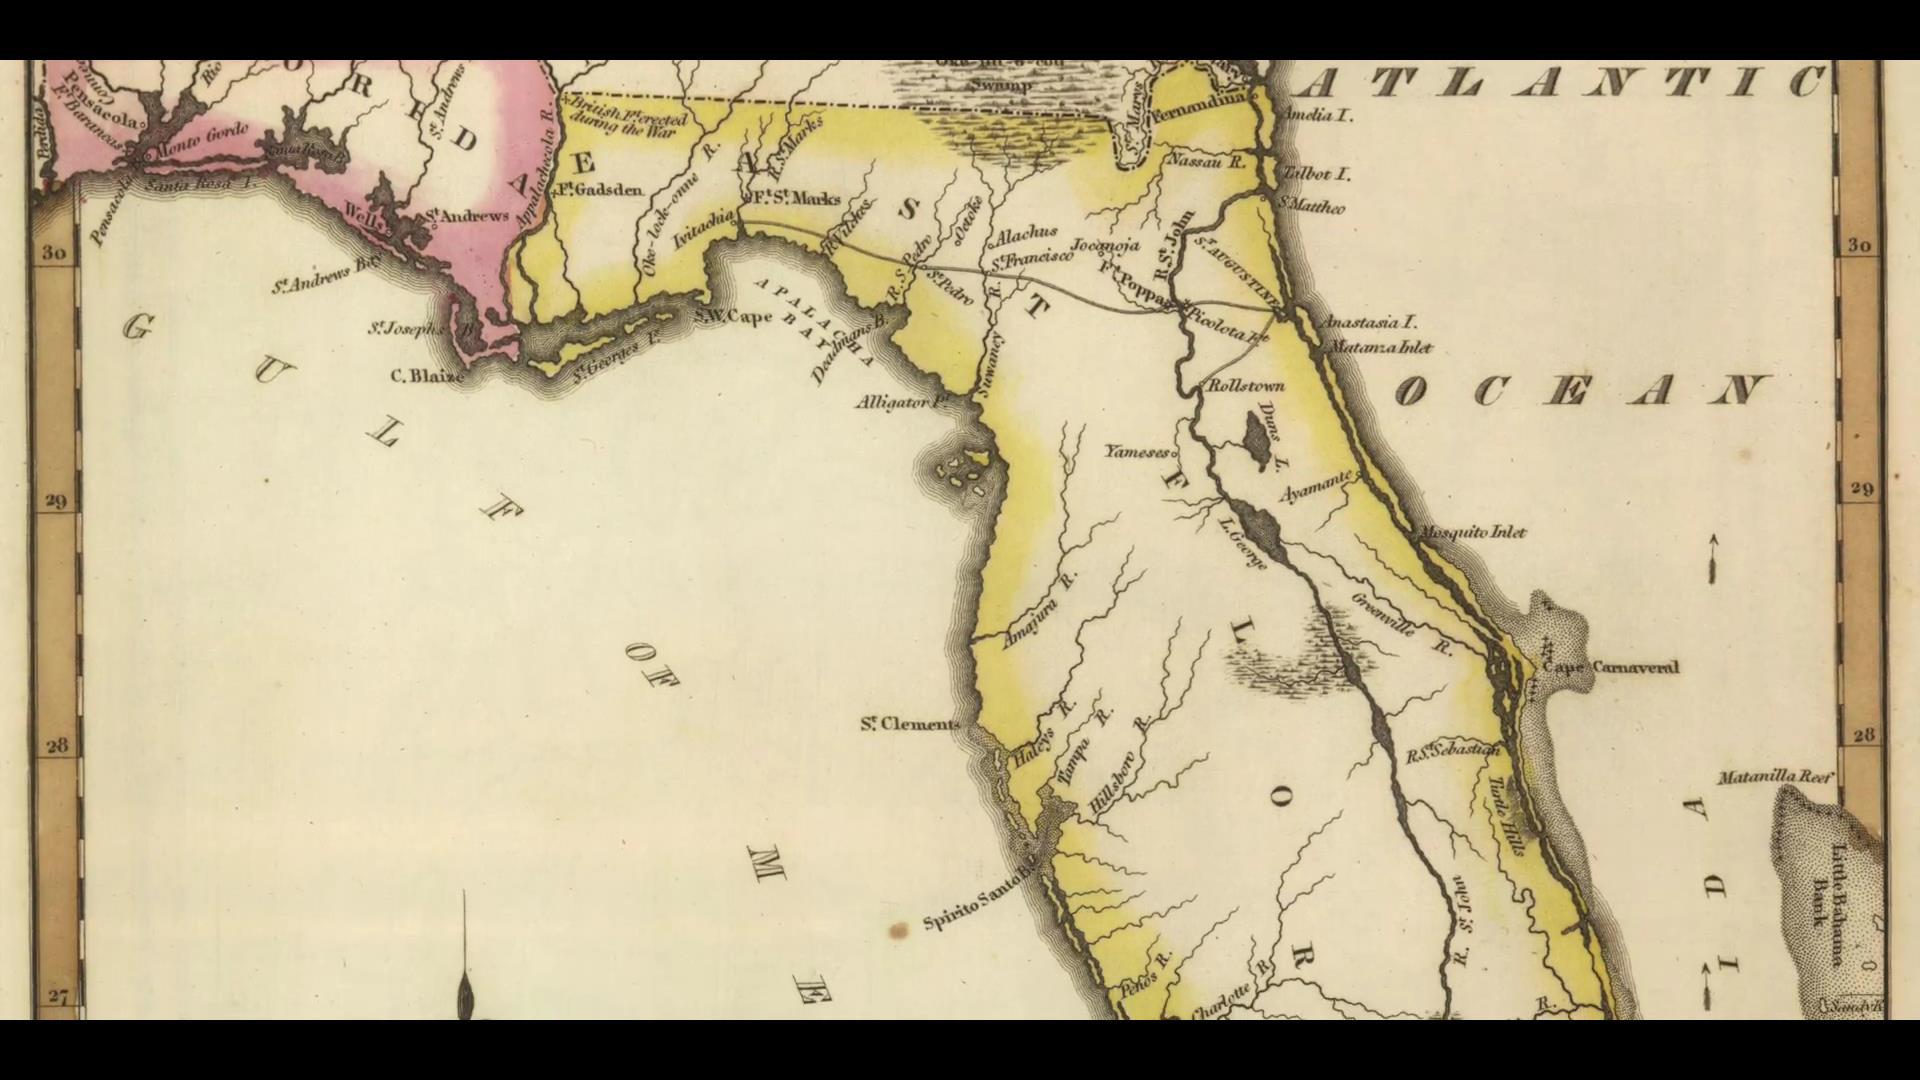 Florida 1860s_08